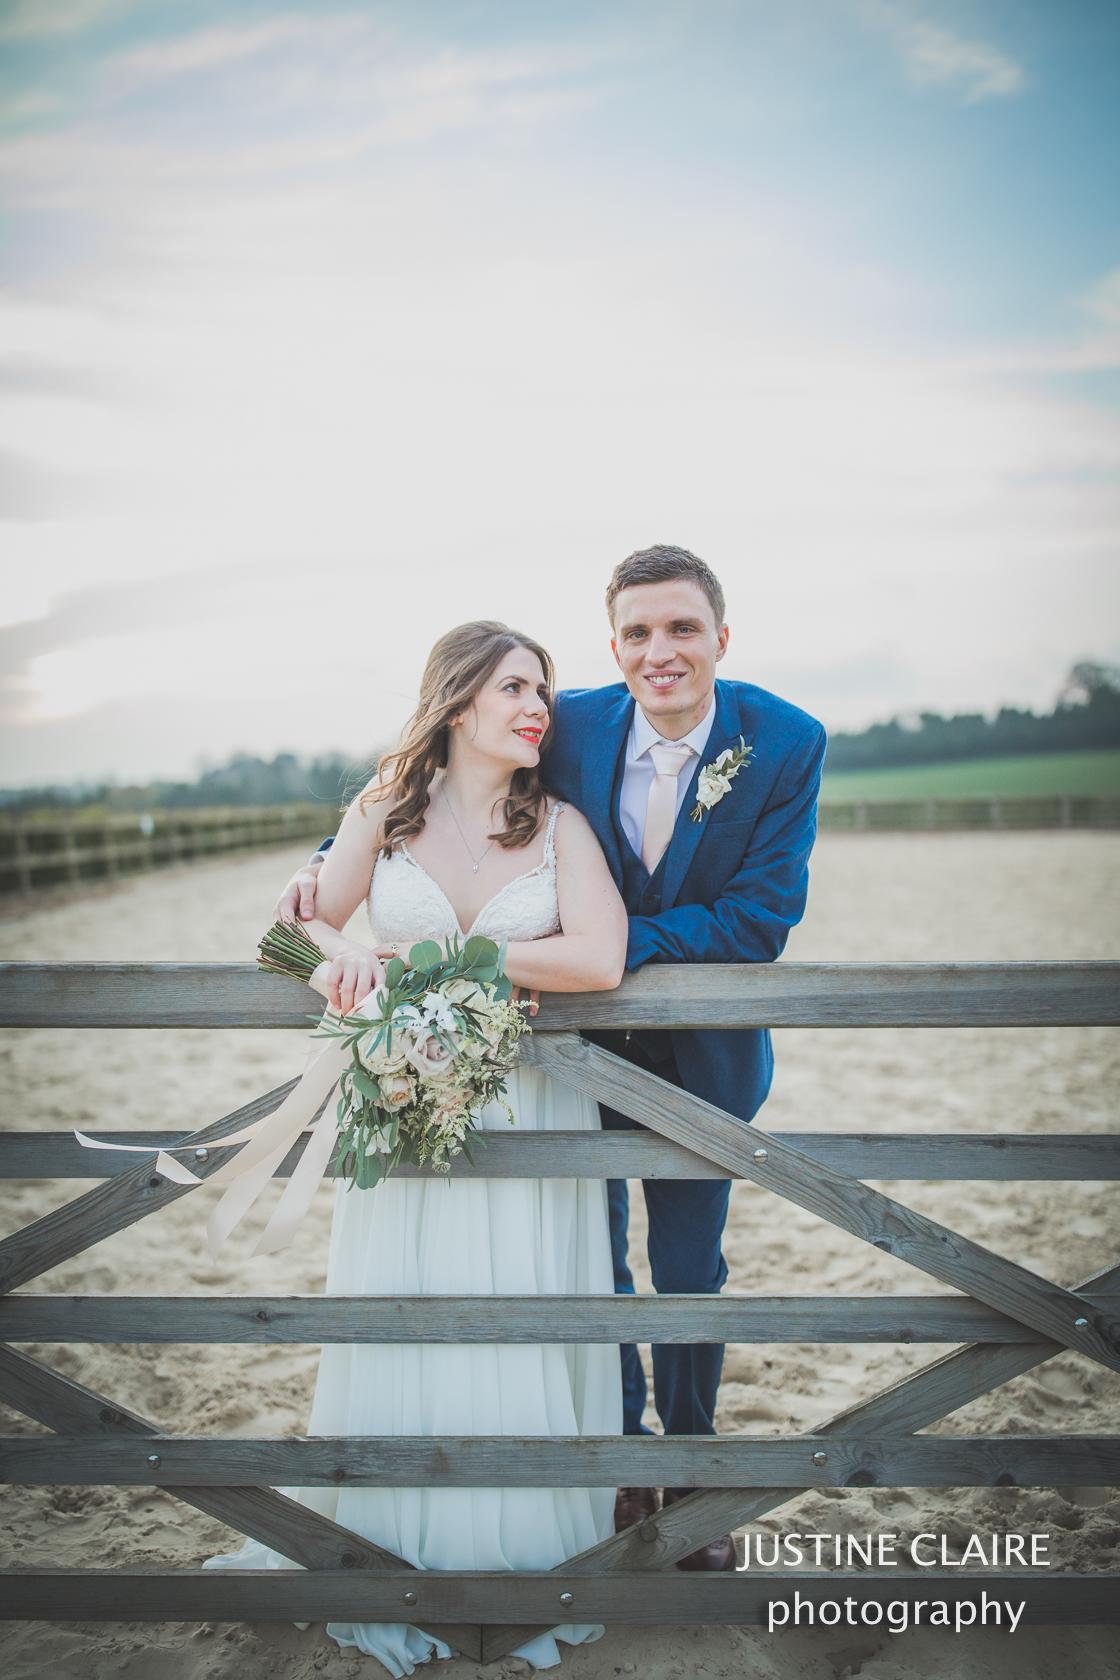 Fitzleroi Fittleworth petworth Billingshurst farm Wedding Photography by Justine Claire photographer Arundel Worthing Brighton-62.jpg